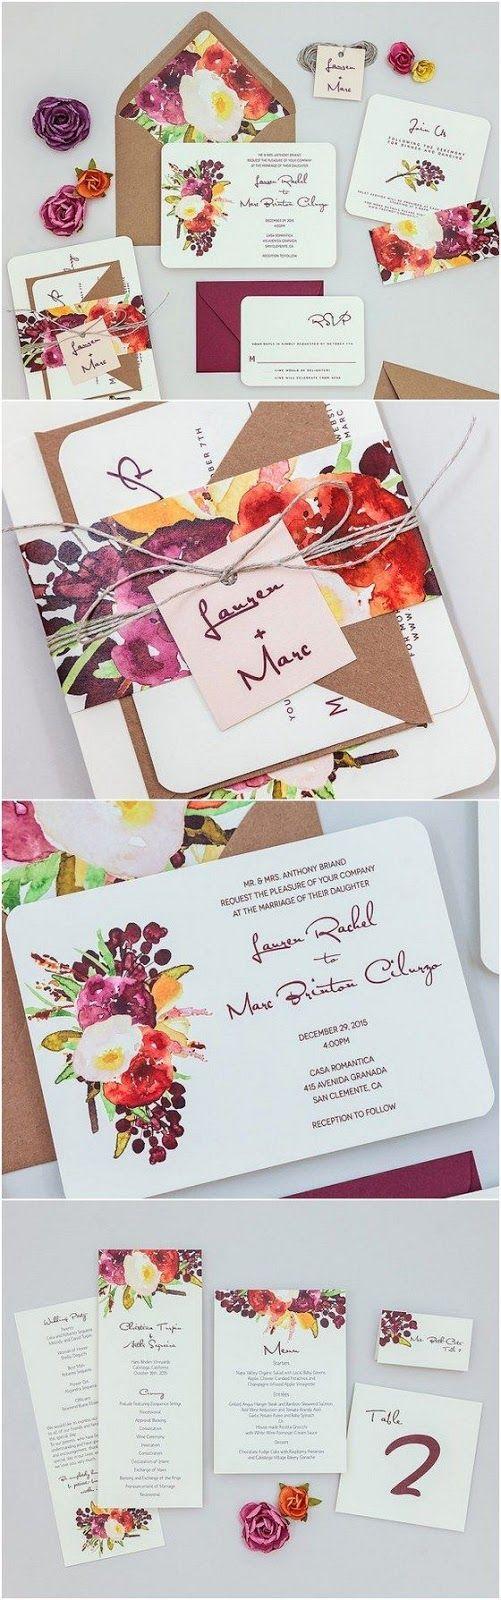 company christmas party invitation templates%0A    Watercolor Wedding Invitation Ideas You Will Love